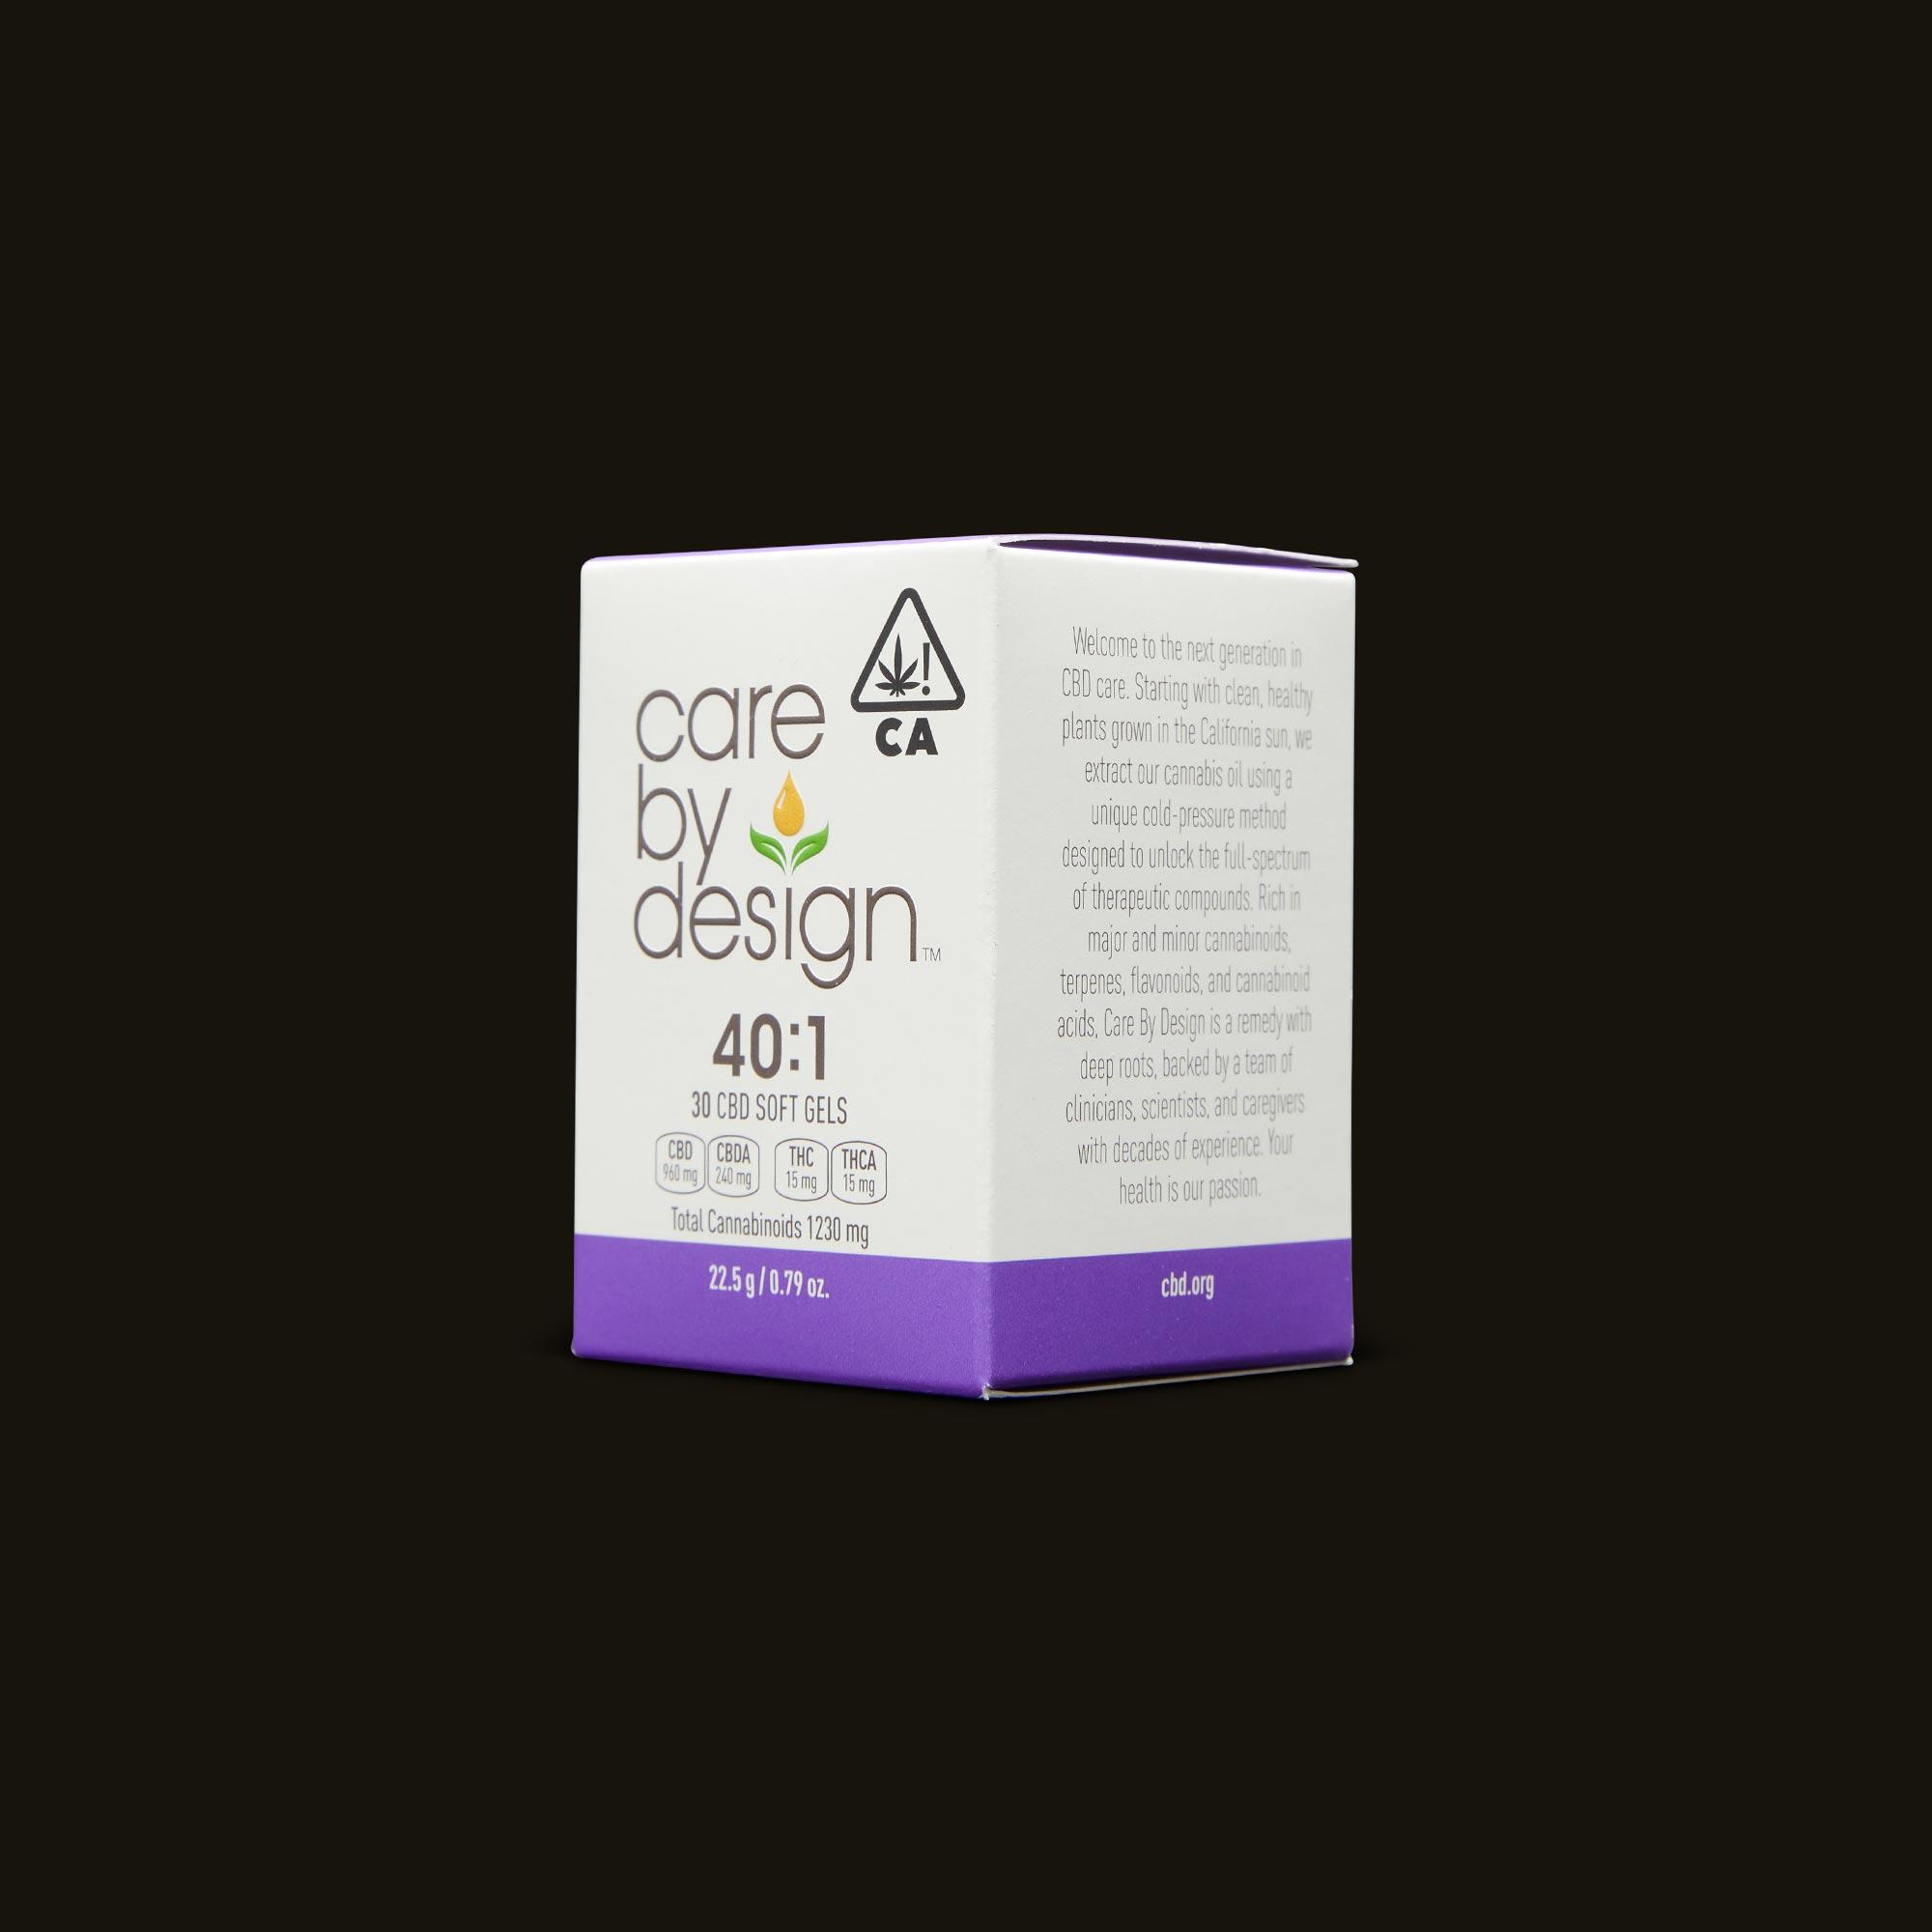 Care By Design 40:1 Soft Gels 30-Pack Side Packaging